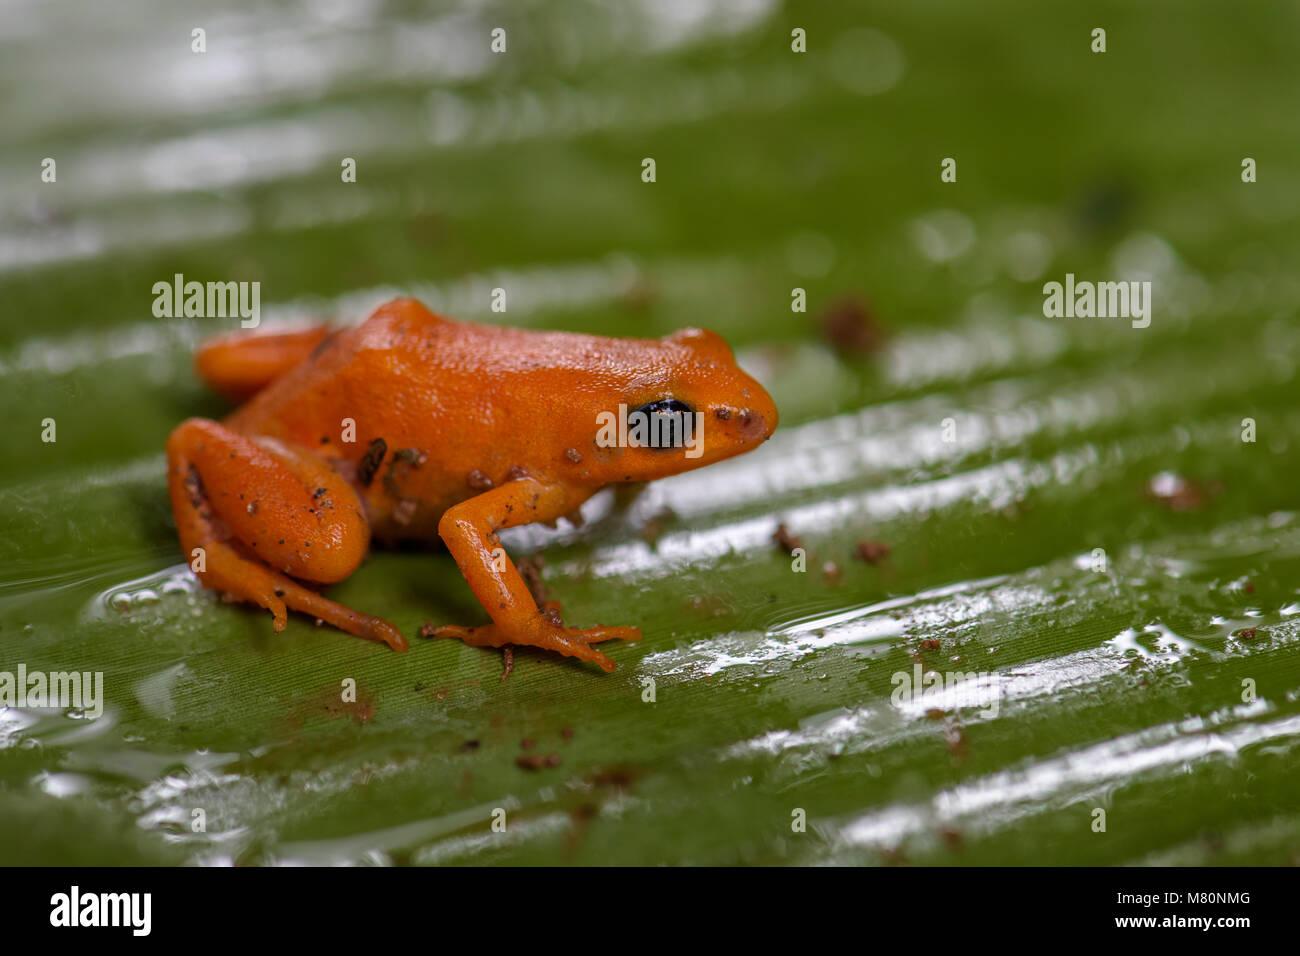 golden mantella - Mantella aurantiaca, beautiful endemic golden frog from Madagascar rain forest. - Stock Image